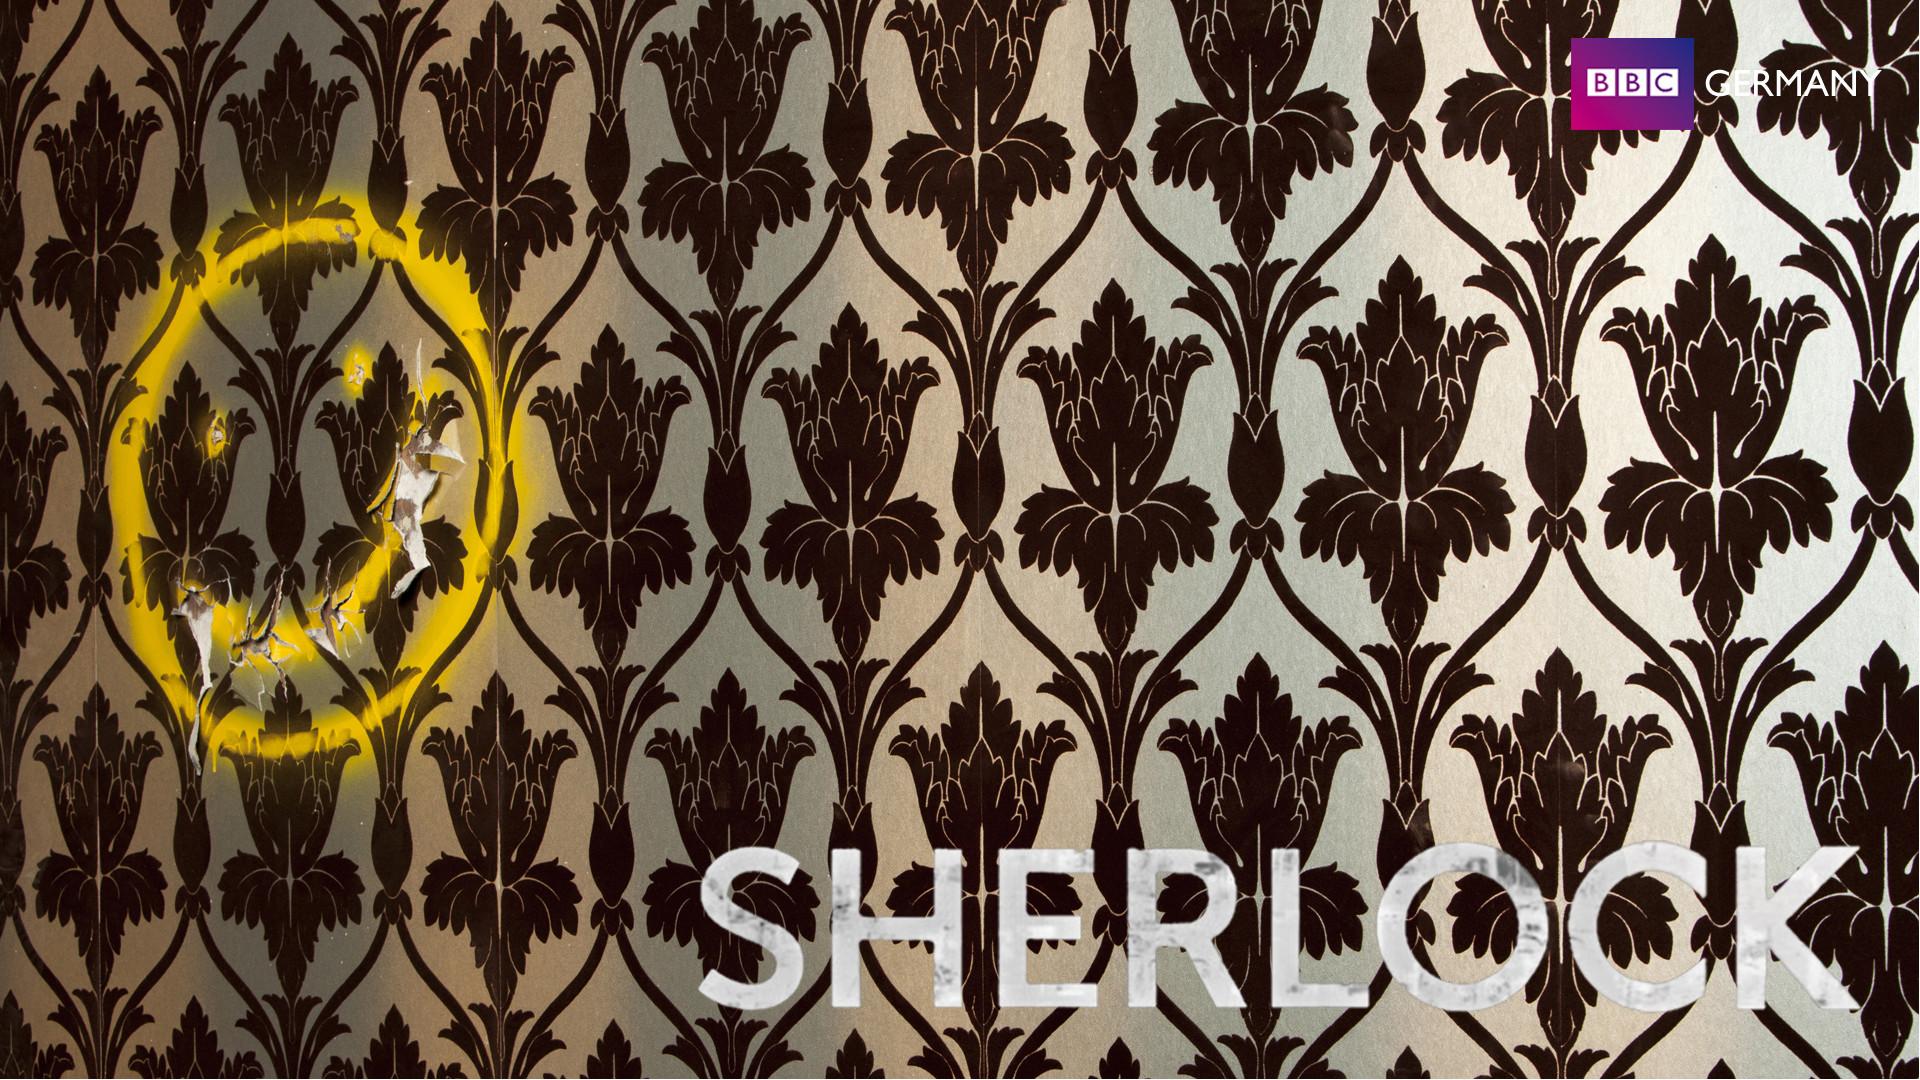 Sherlock Wallpaper   77 Wallpapers   Quality HD Wallpapers